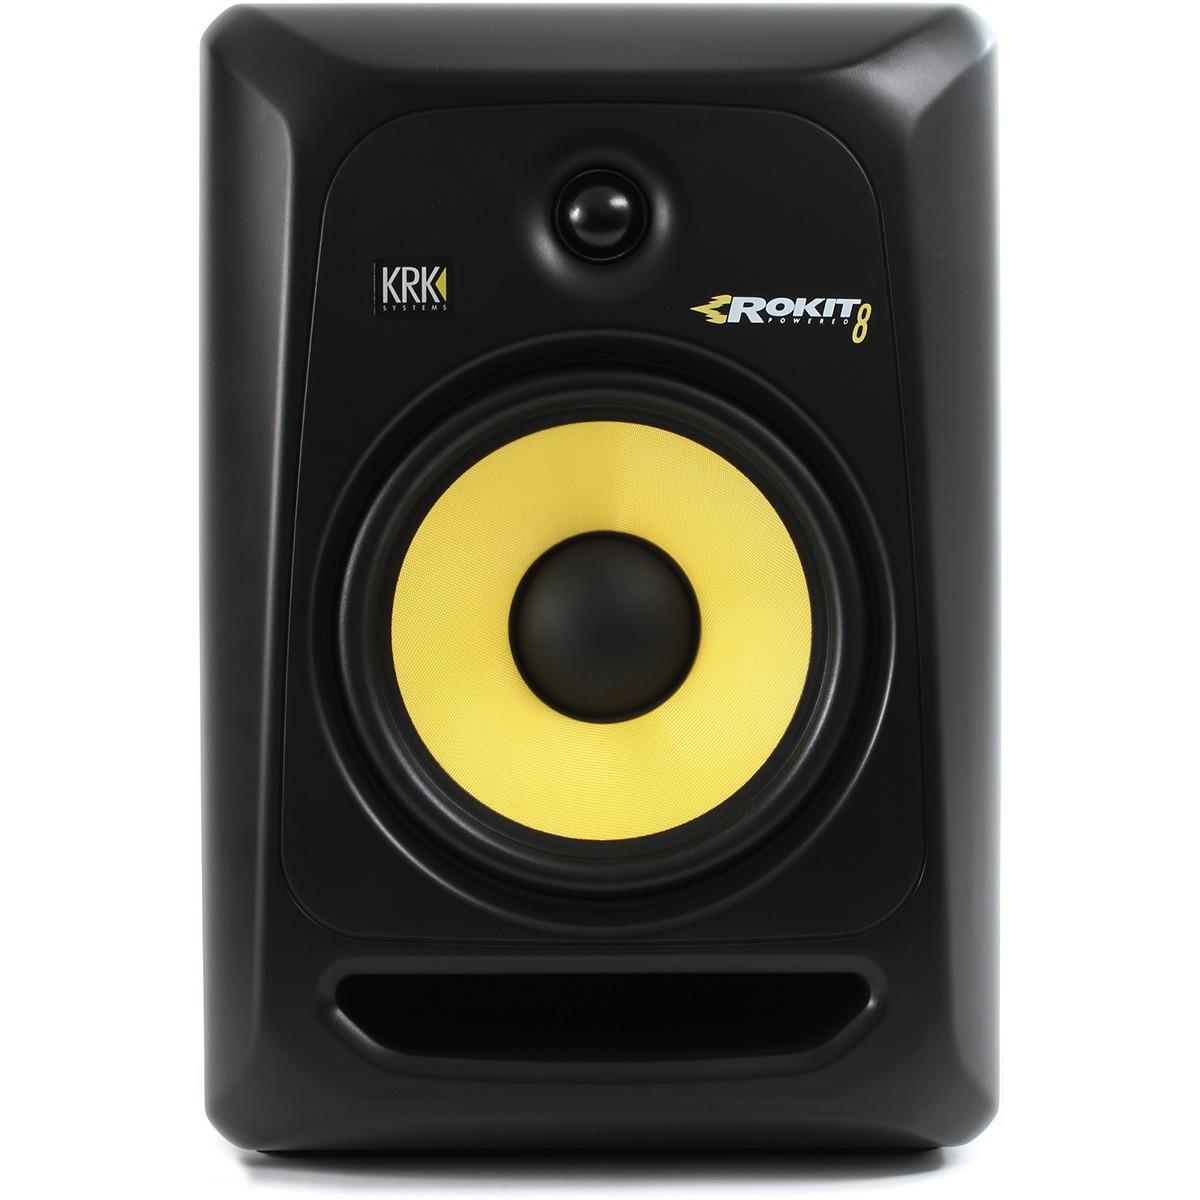 KRK Rokit 8 G3 RP8 Monitor de Áudio, Preto, 110v, Unidade